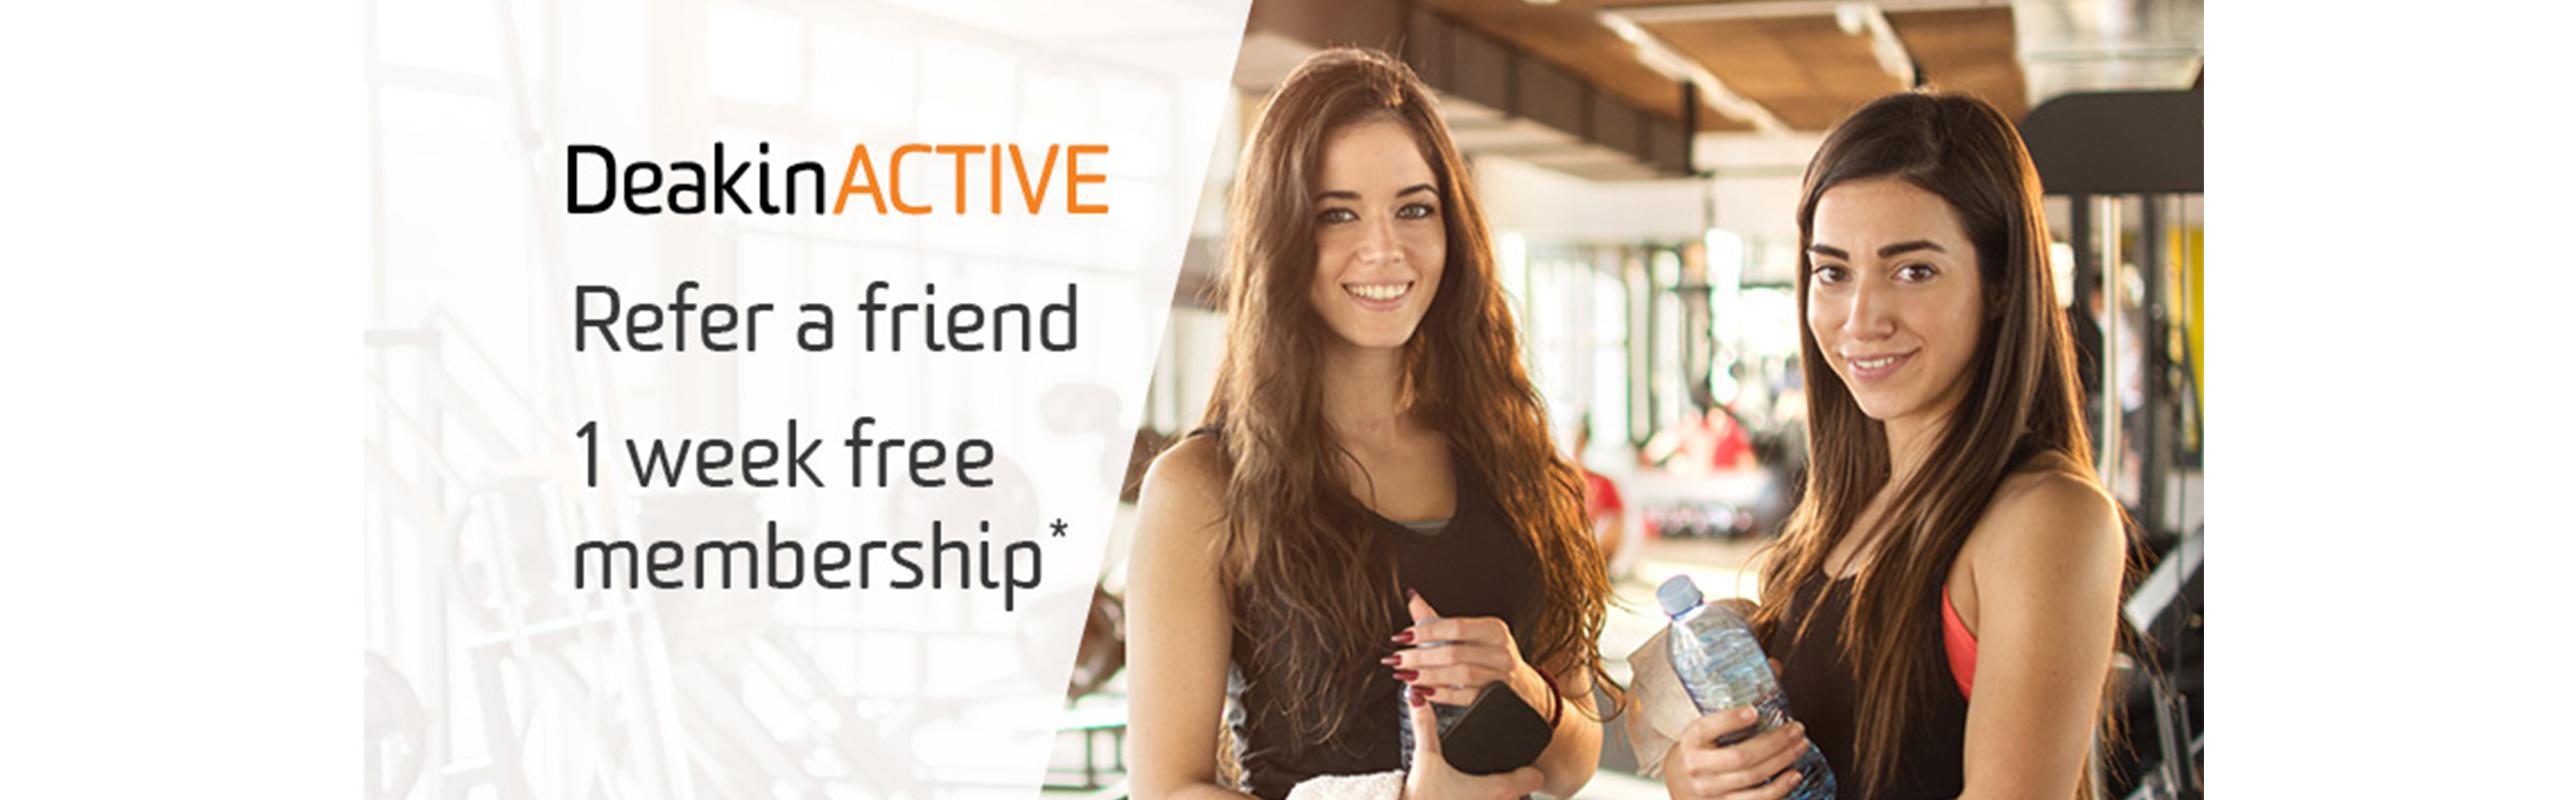 DeakinACTIVE Refer a friend campaign